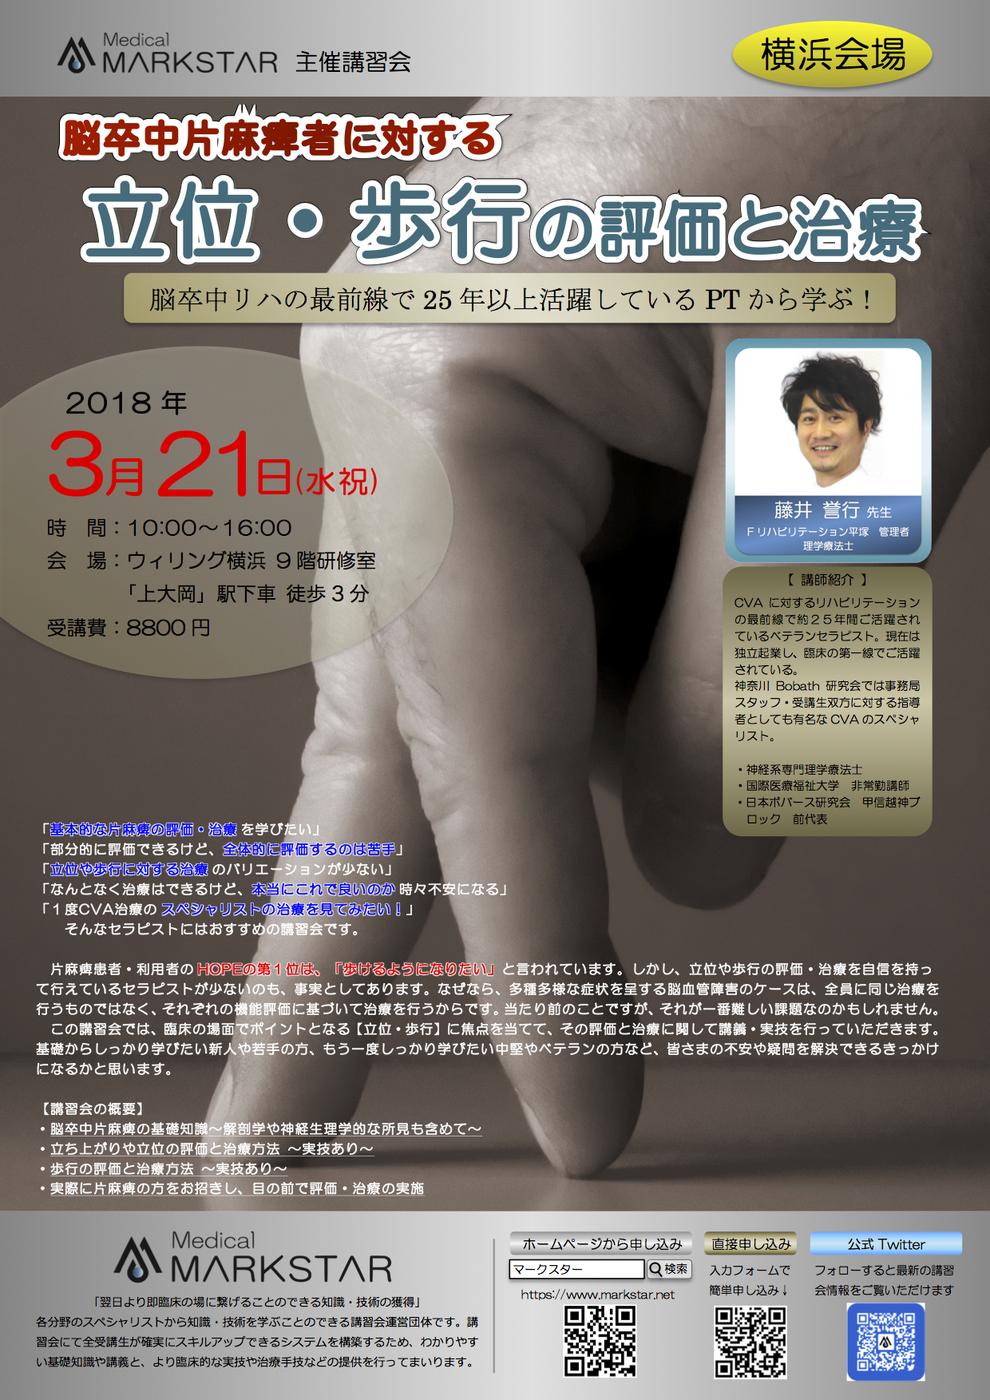 MARKSTAR講習会 「立位・歩行の評価と治療」